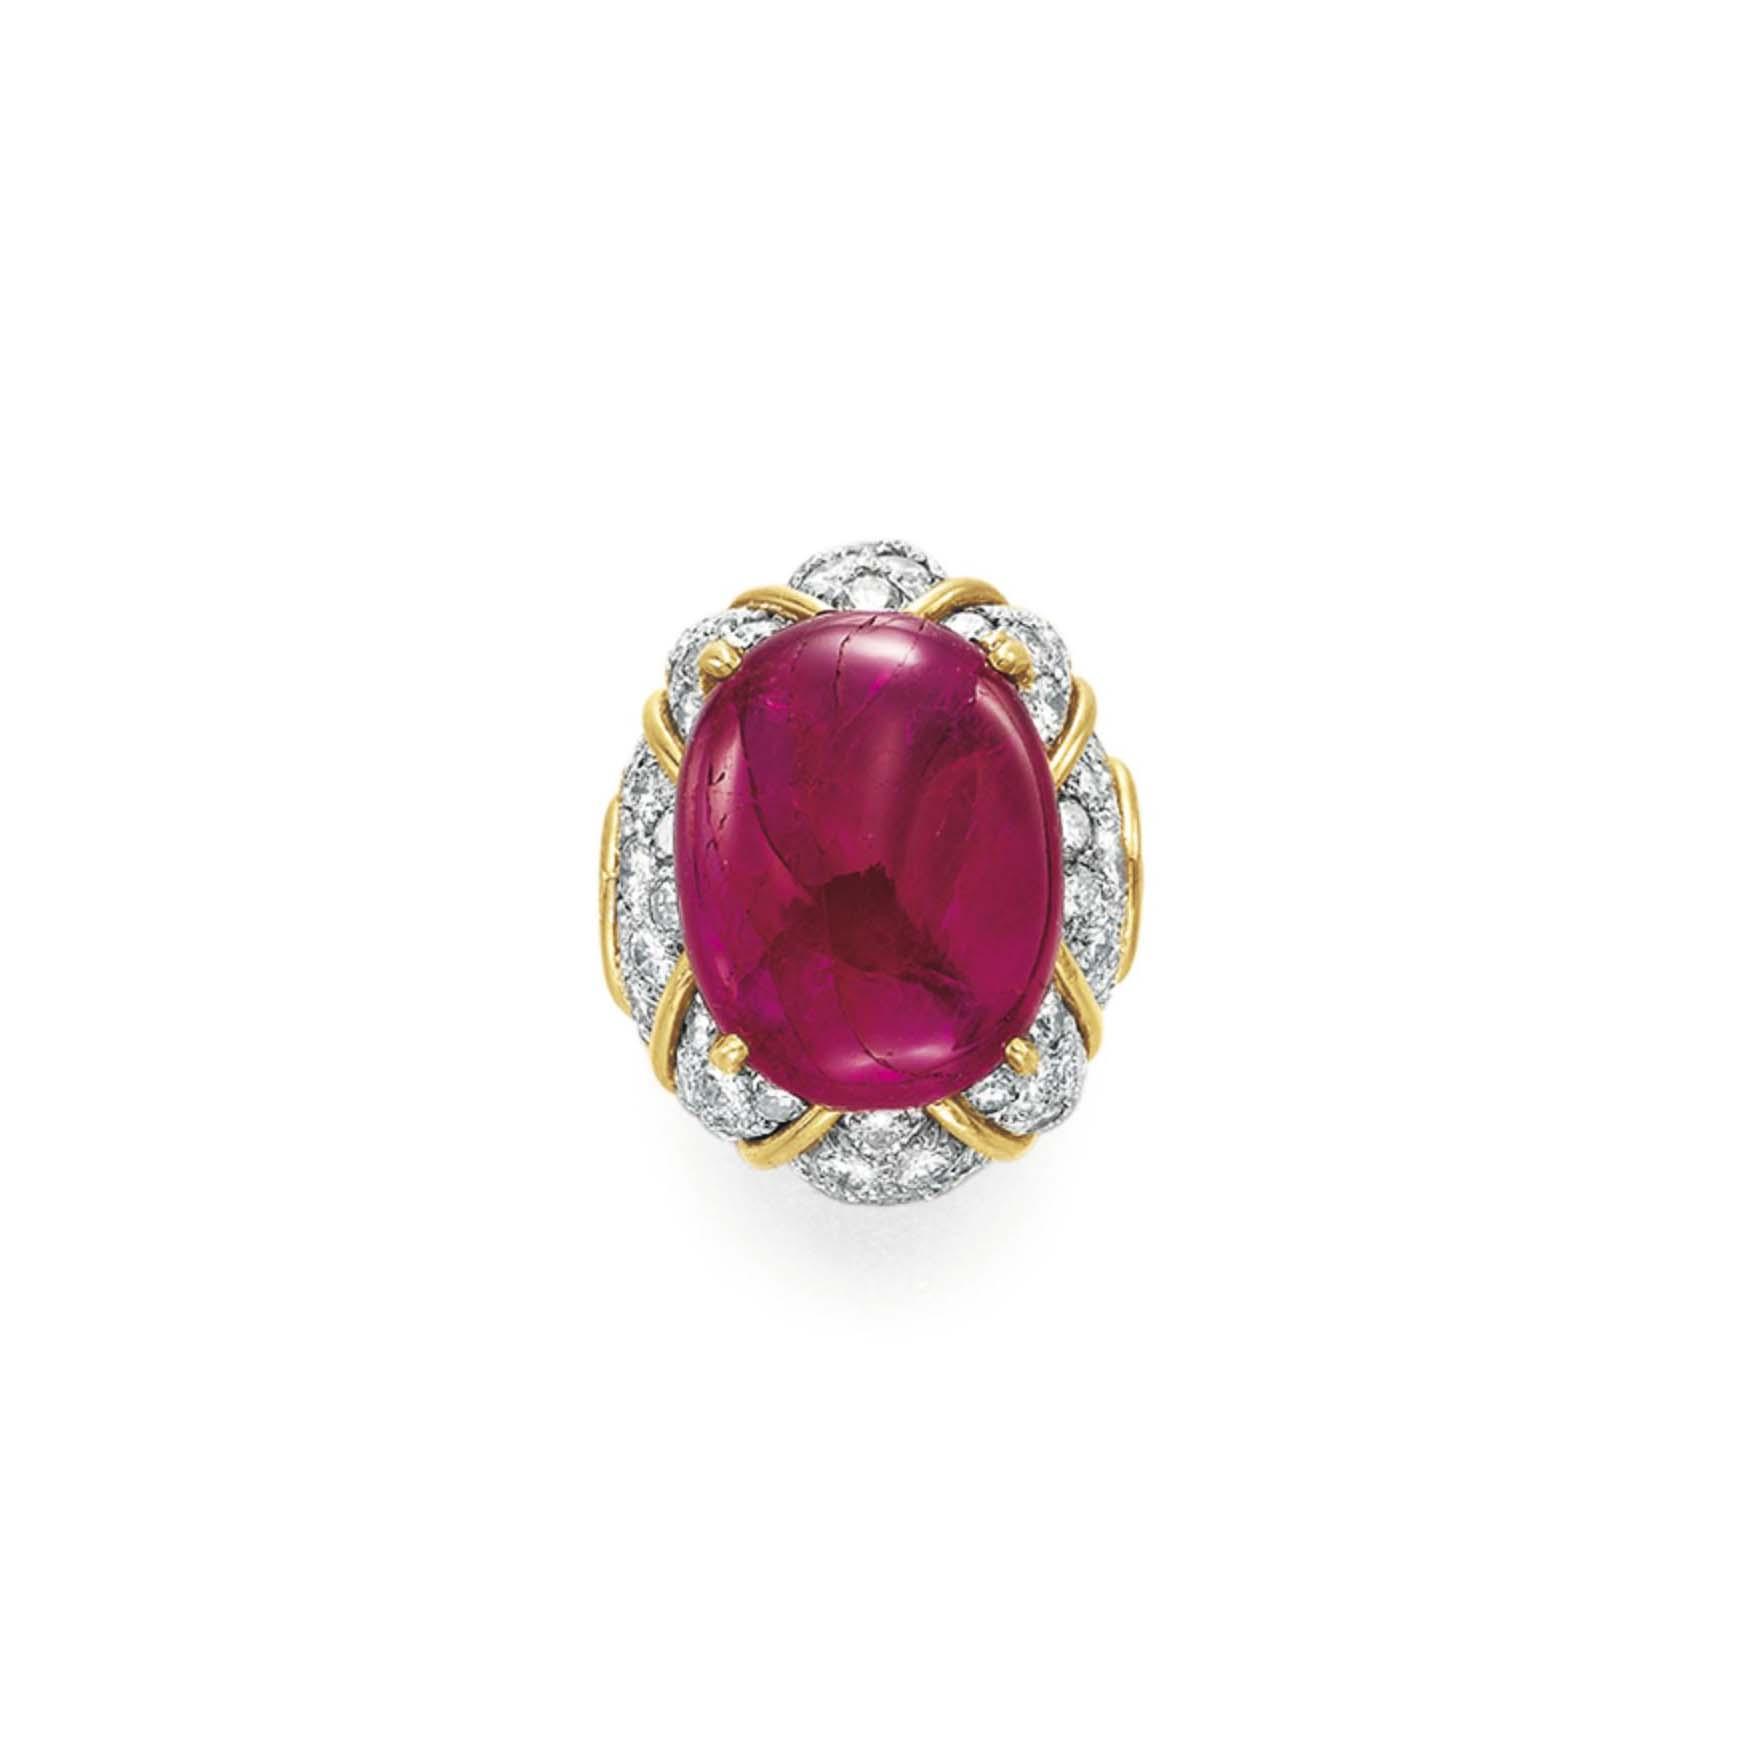 A RUBY AND DIAMOND RING, BY DAVID WEBB